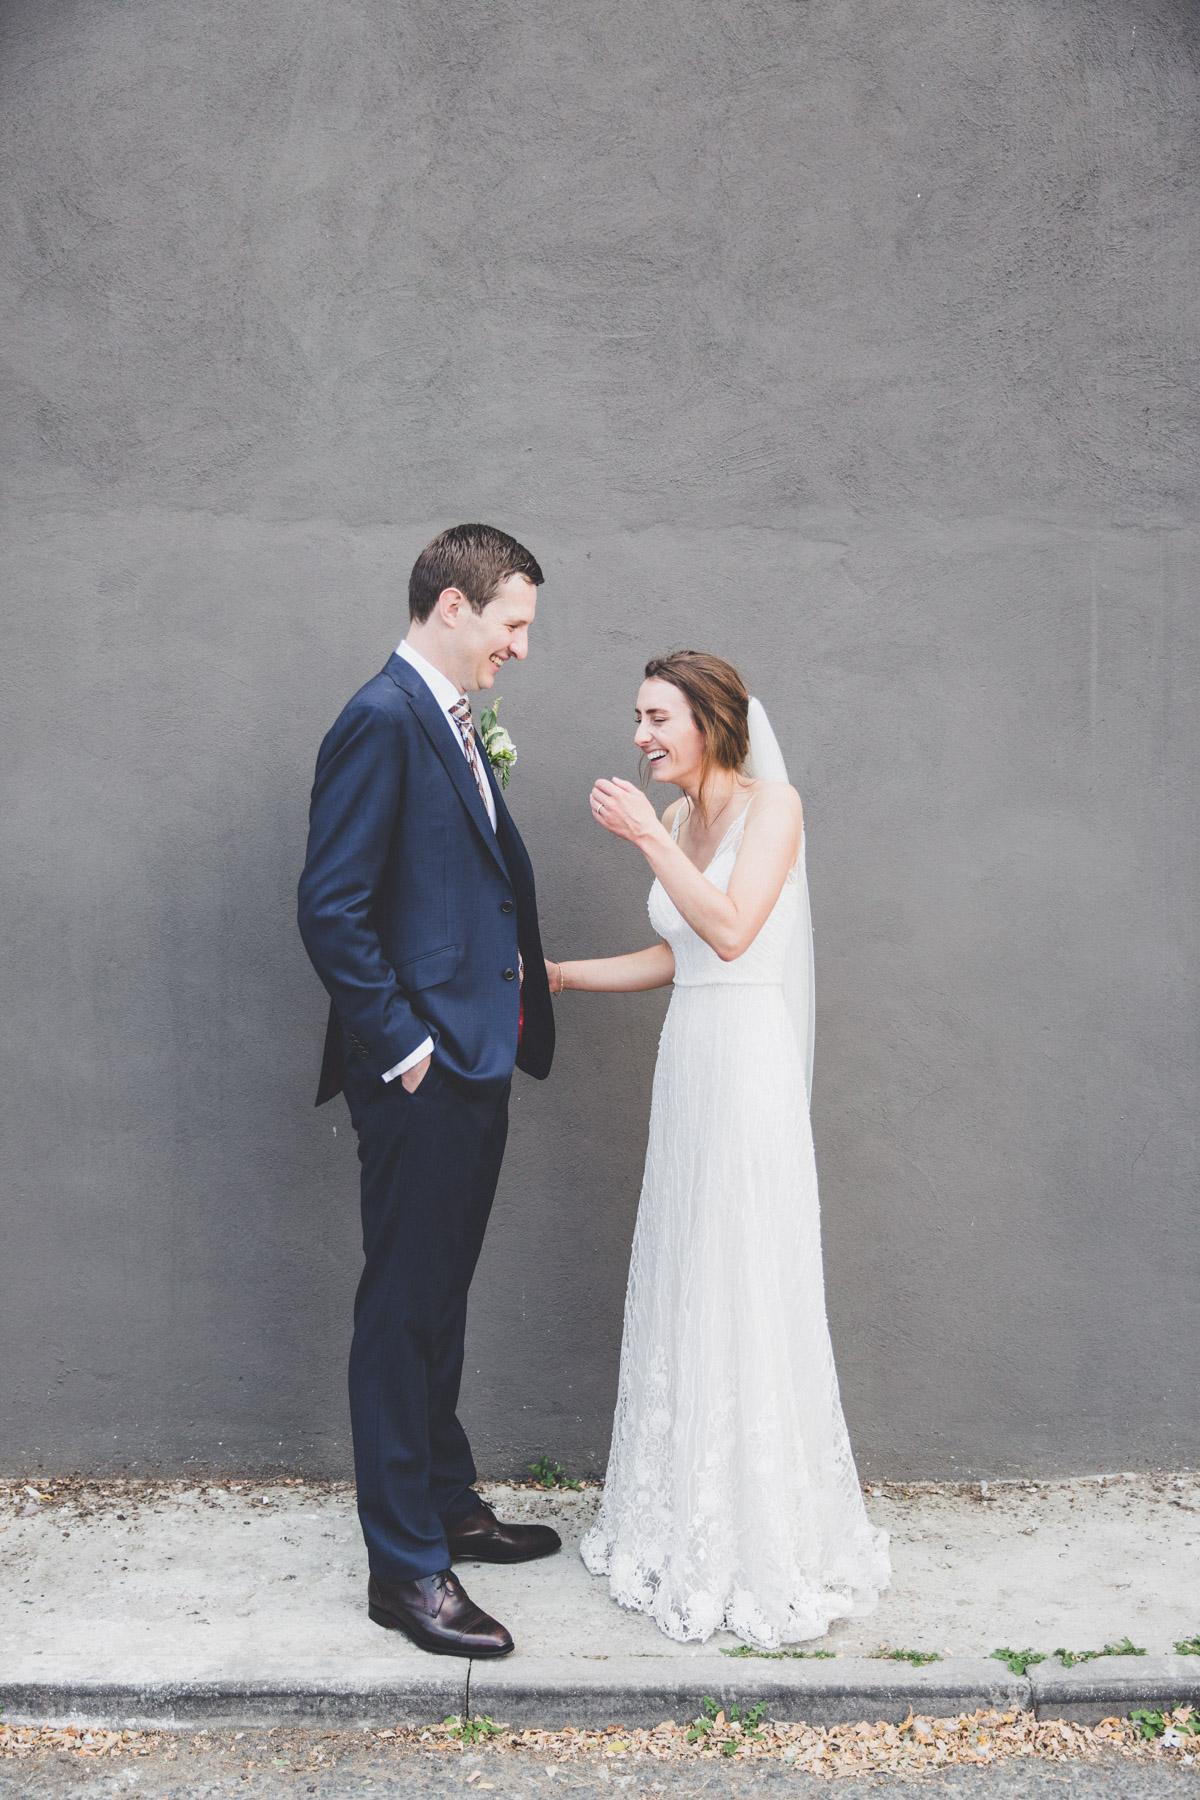 kate-gray-wedding-photography-137.jpg